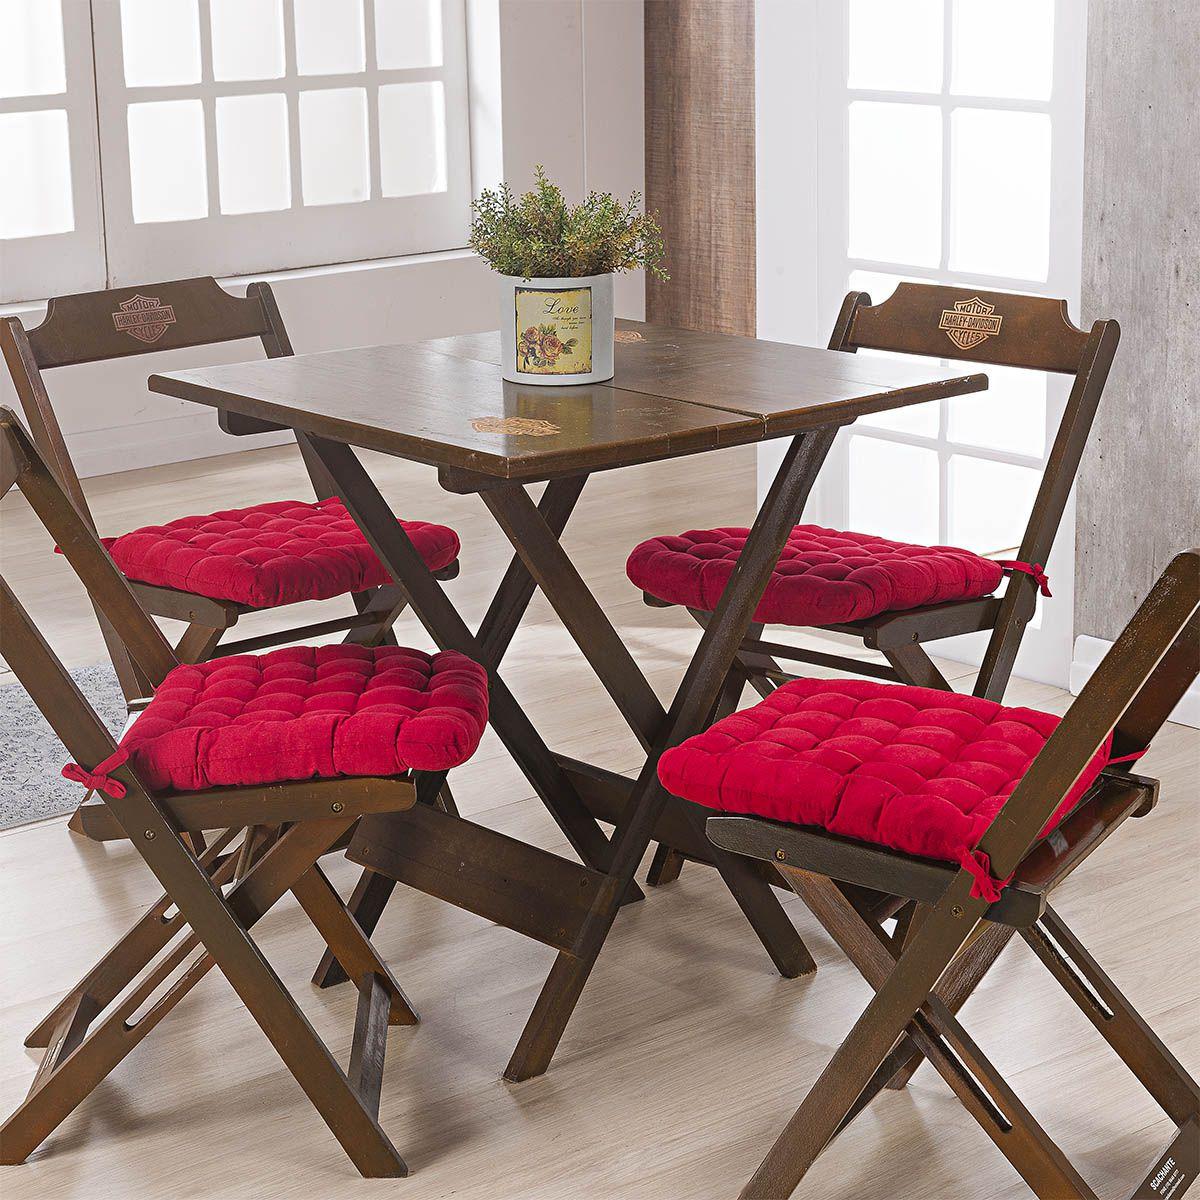 Kit C/ 4 - Assentos P/ Cadeira - Futton - Kalamar - 40cm x 40cm - Vermelho - Niazitex